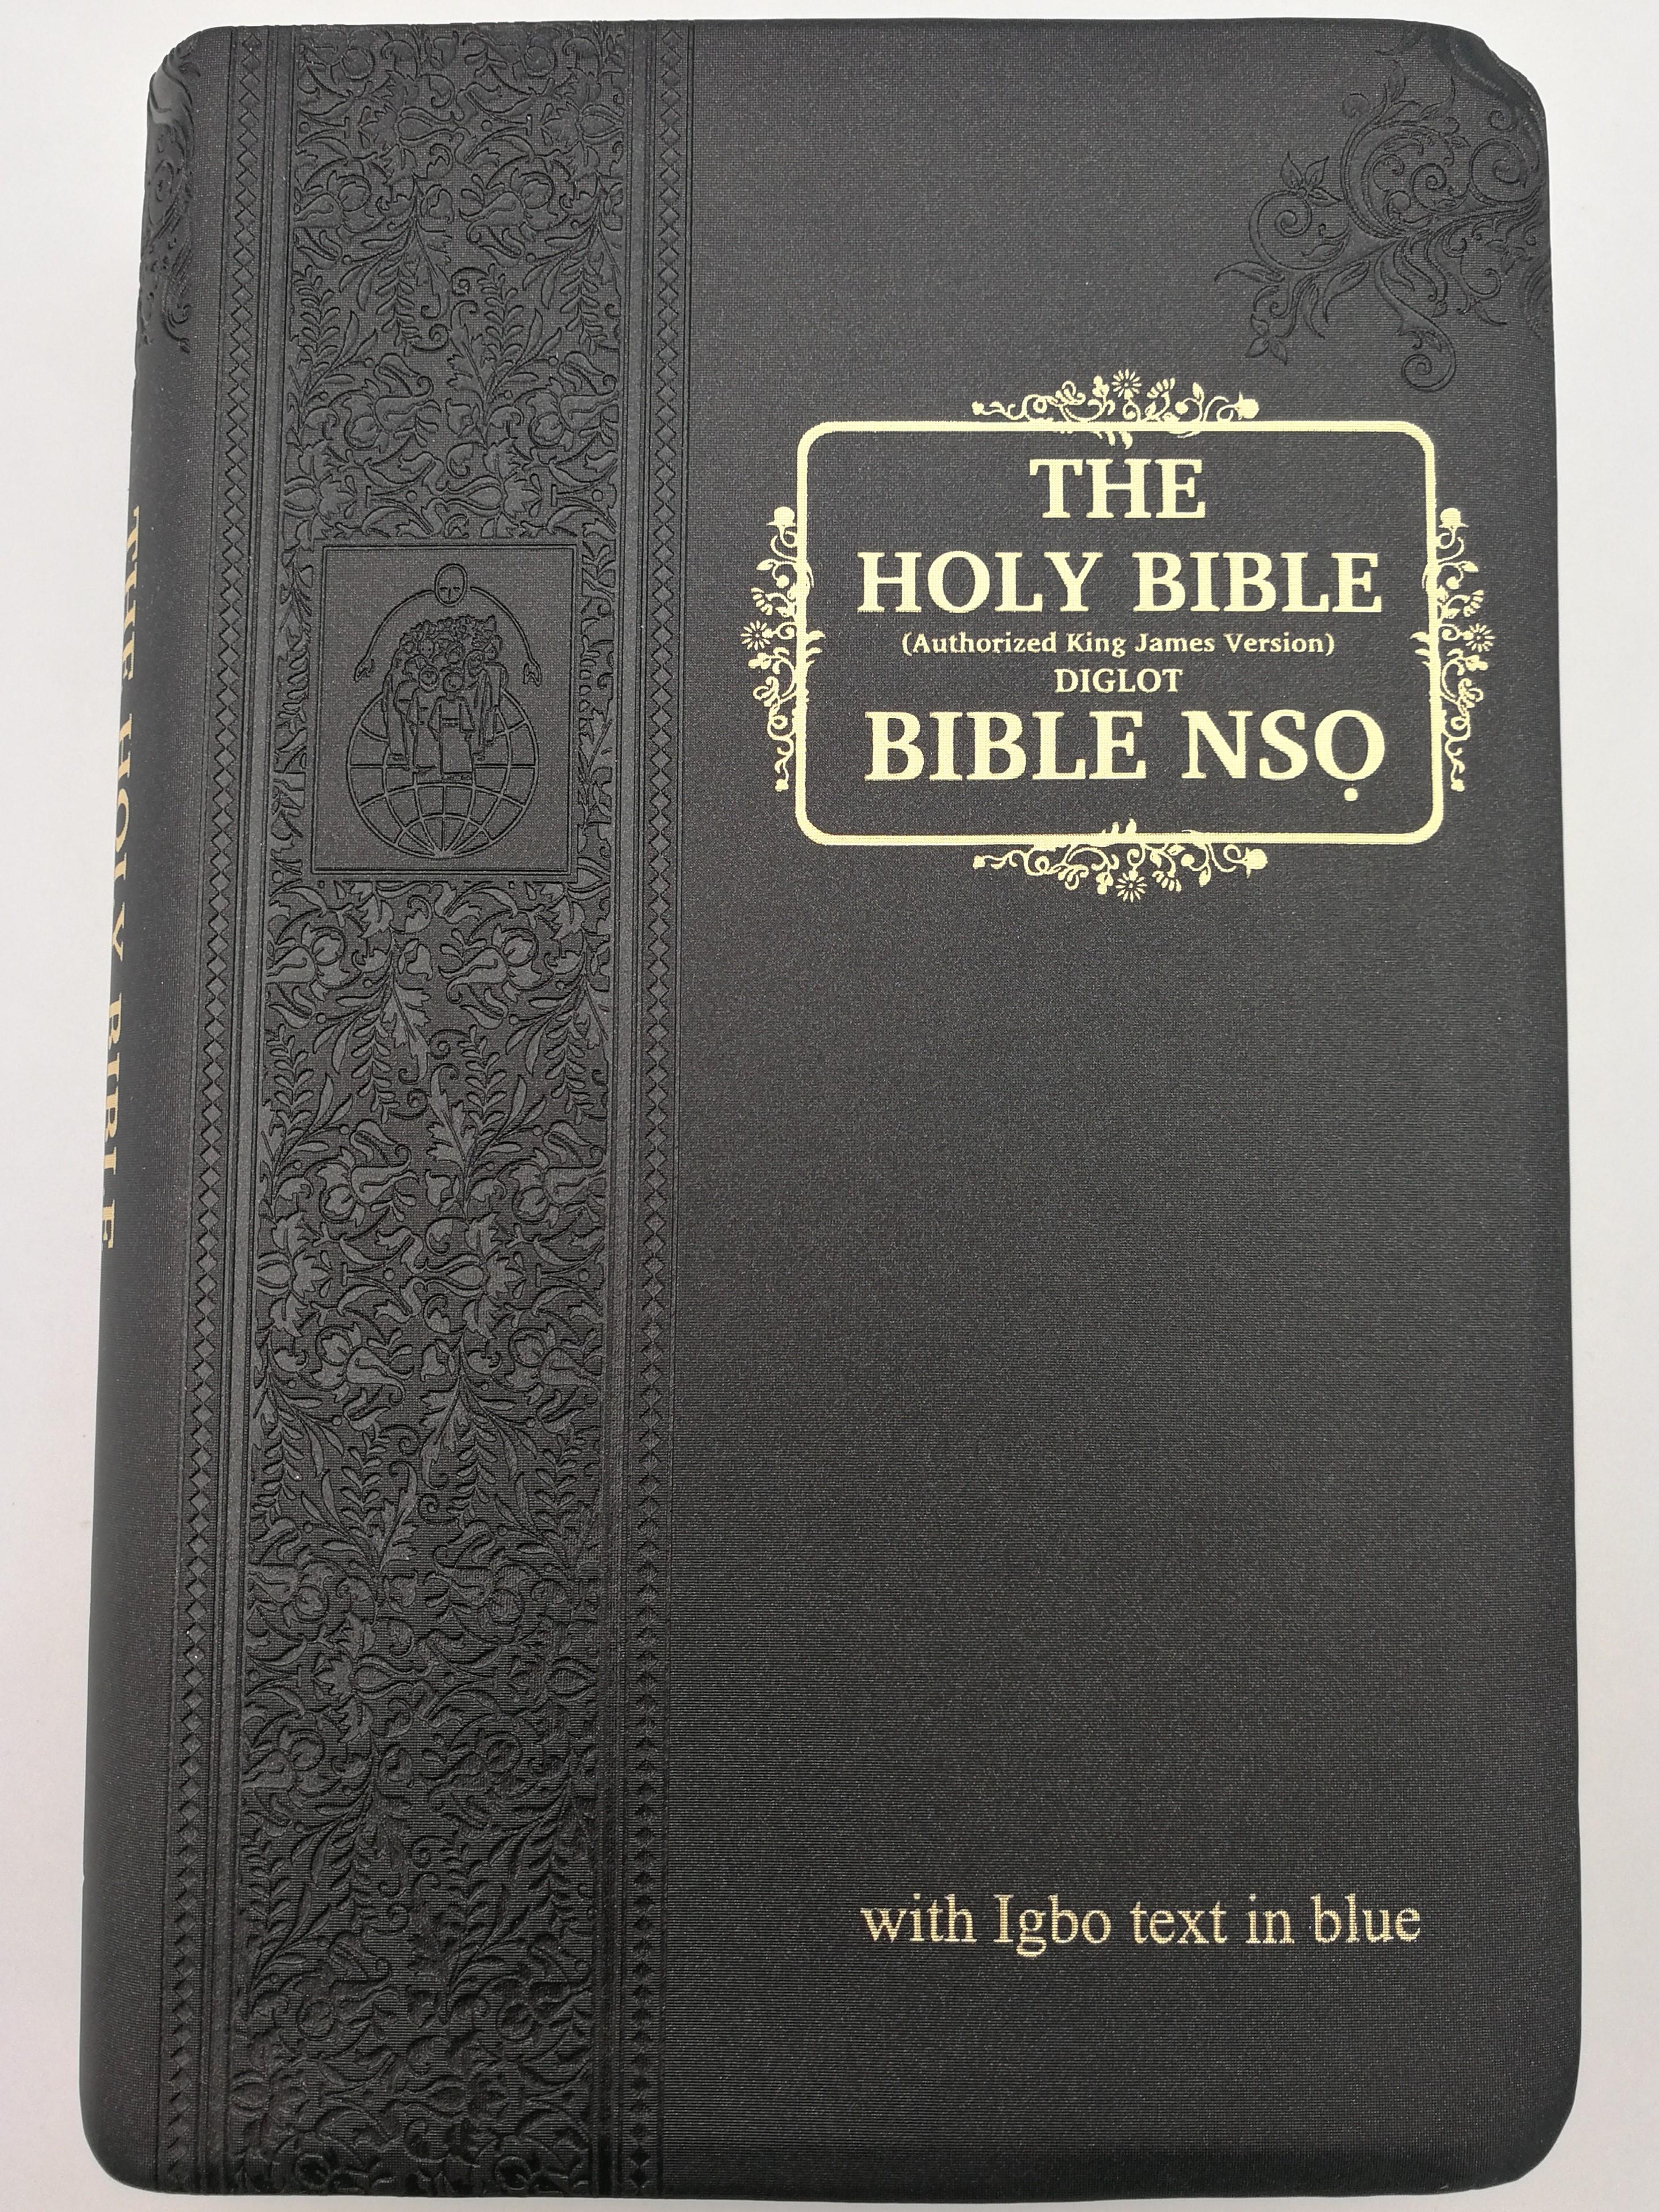 diglot-english-igbo-holy-bible-akjv-bible-ns-1.jpg